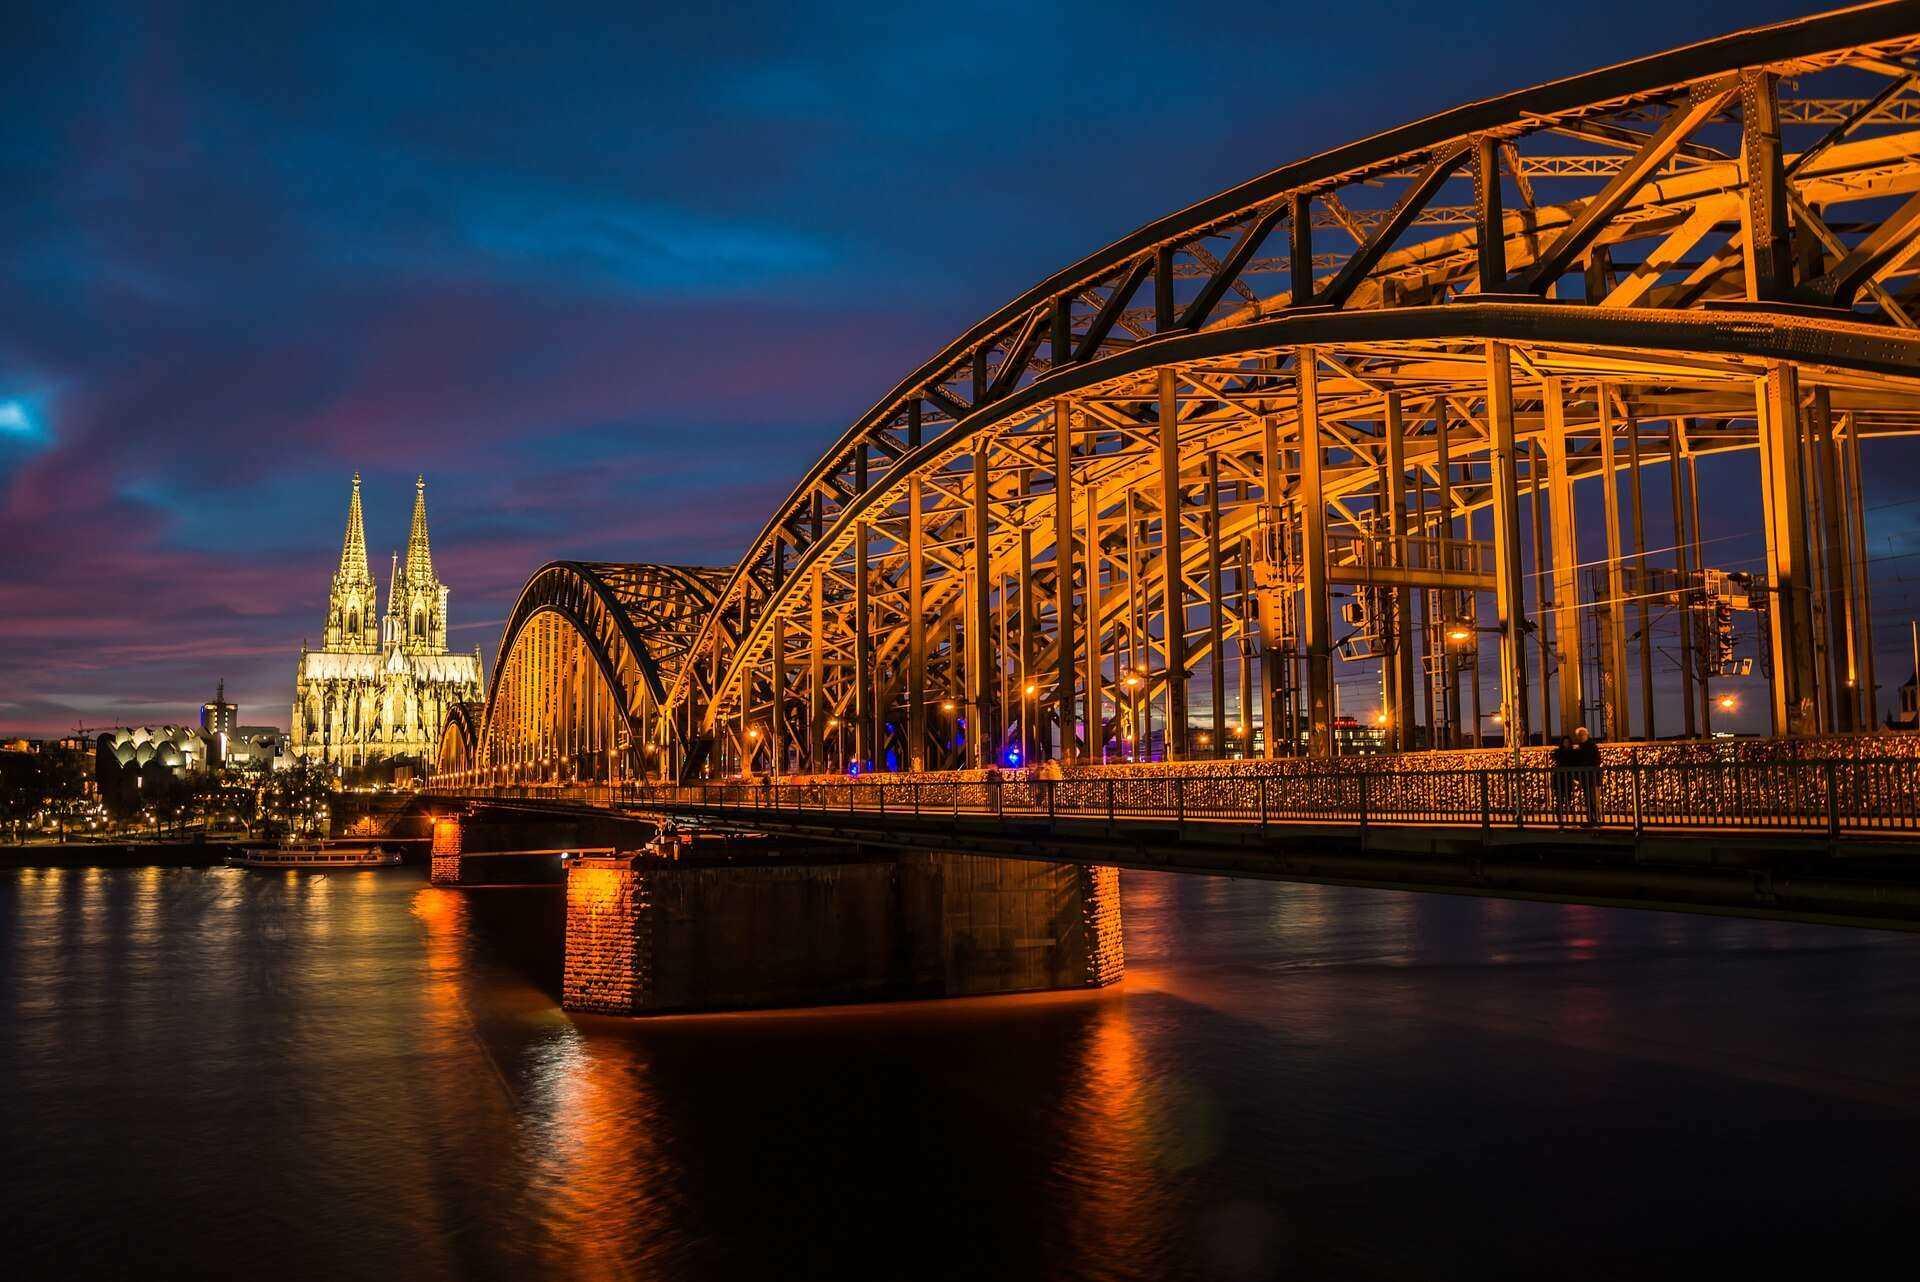 Direktflüge und Billigflüge ab Berlin-Tegel nach Köln/Bonn